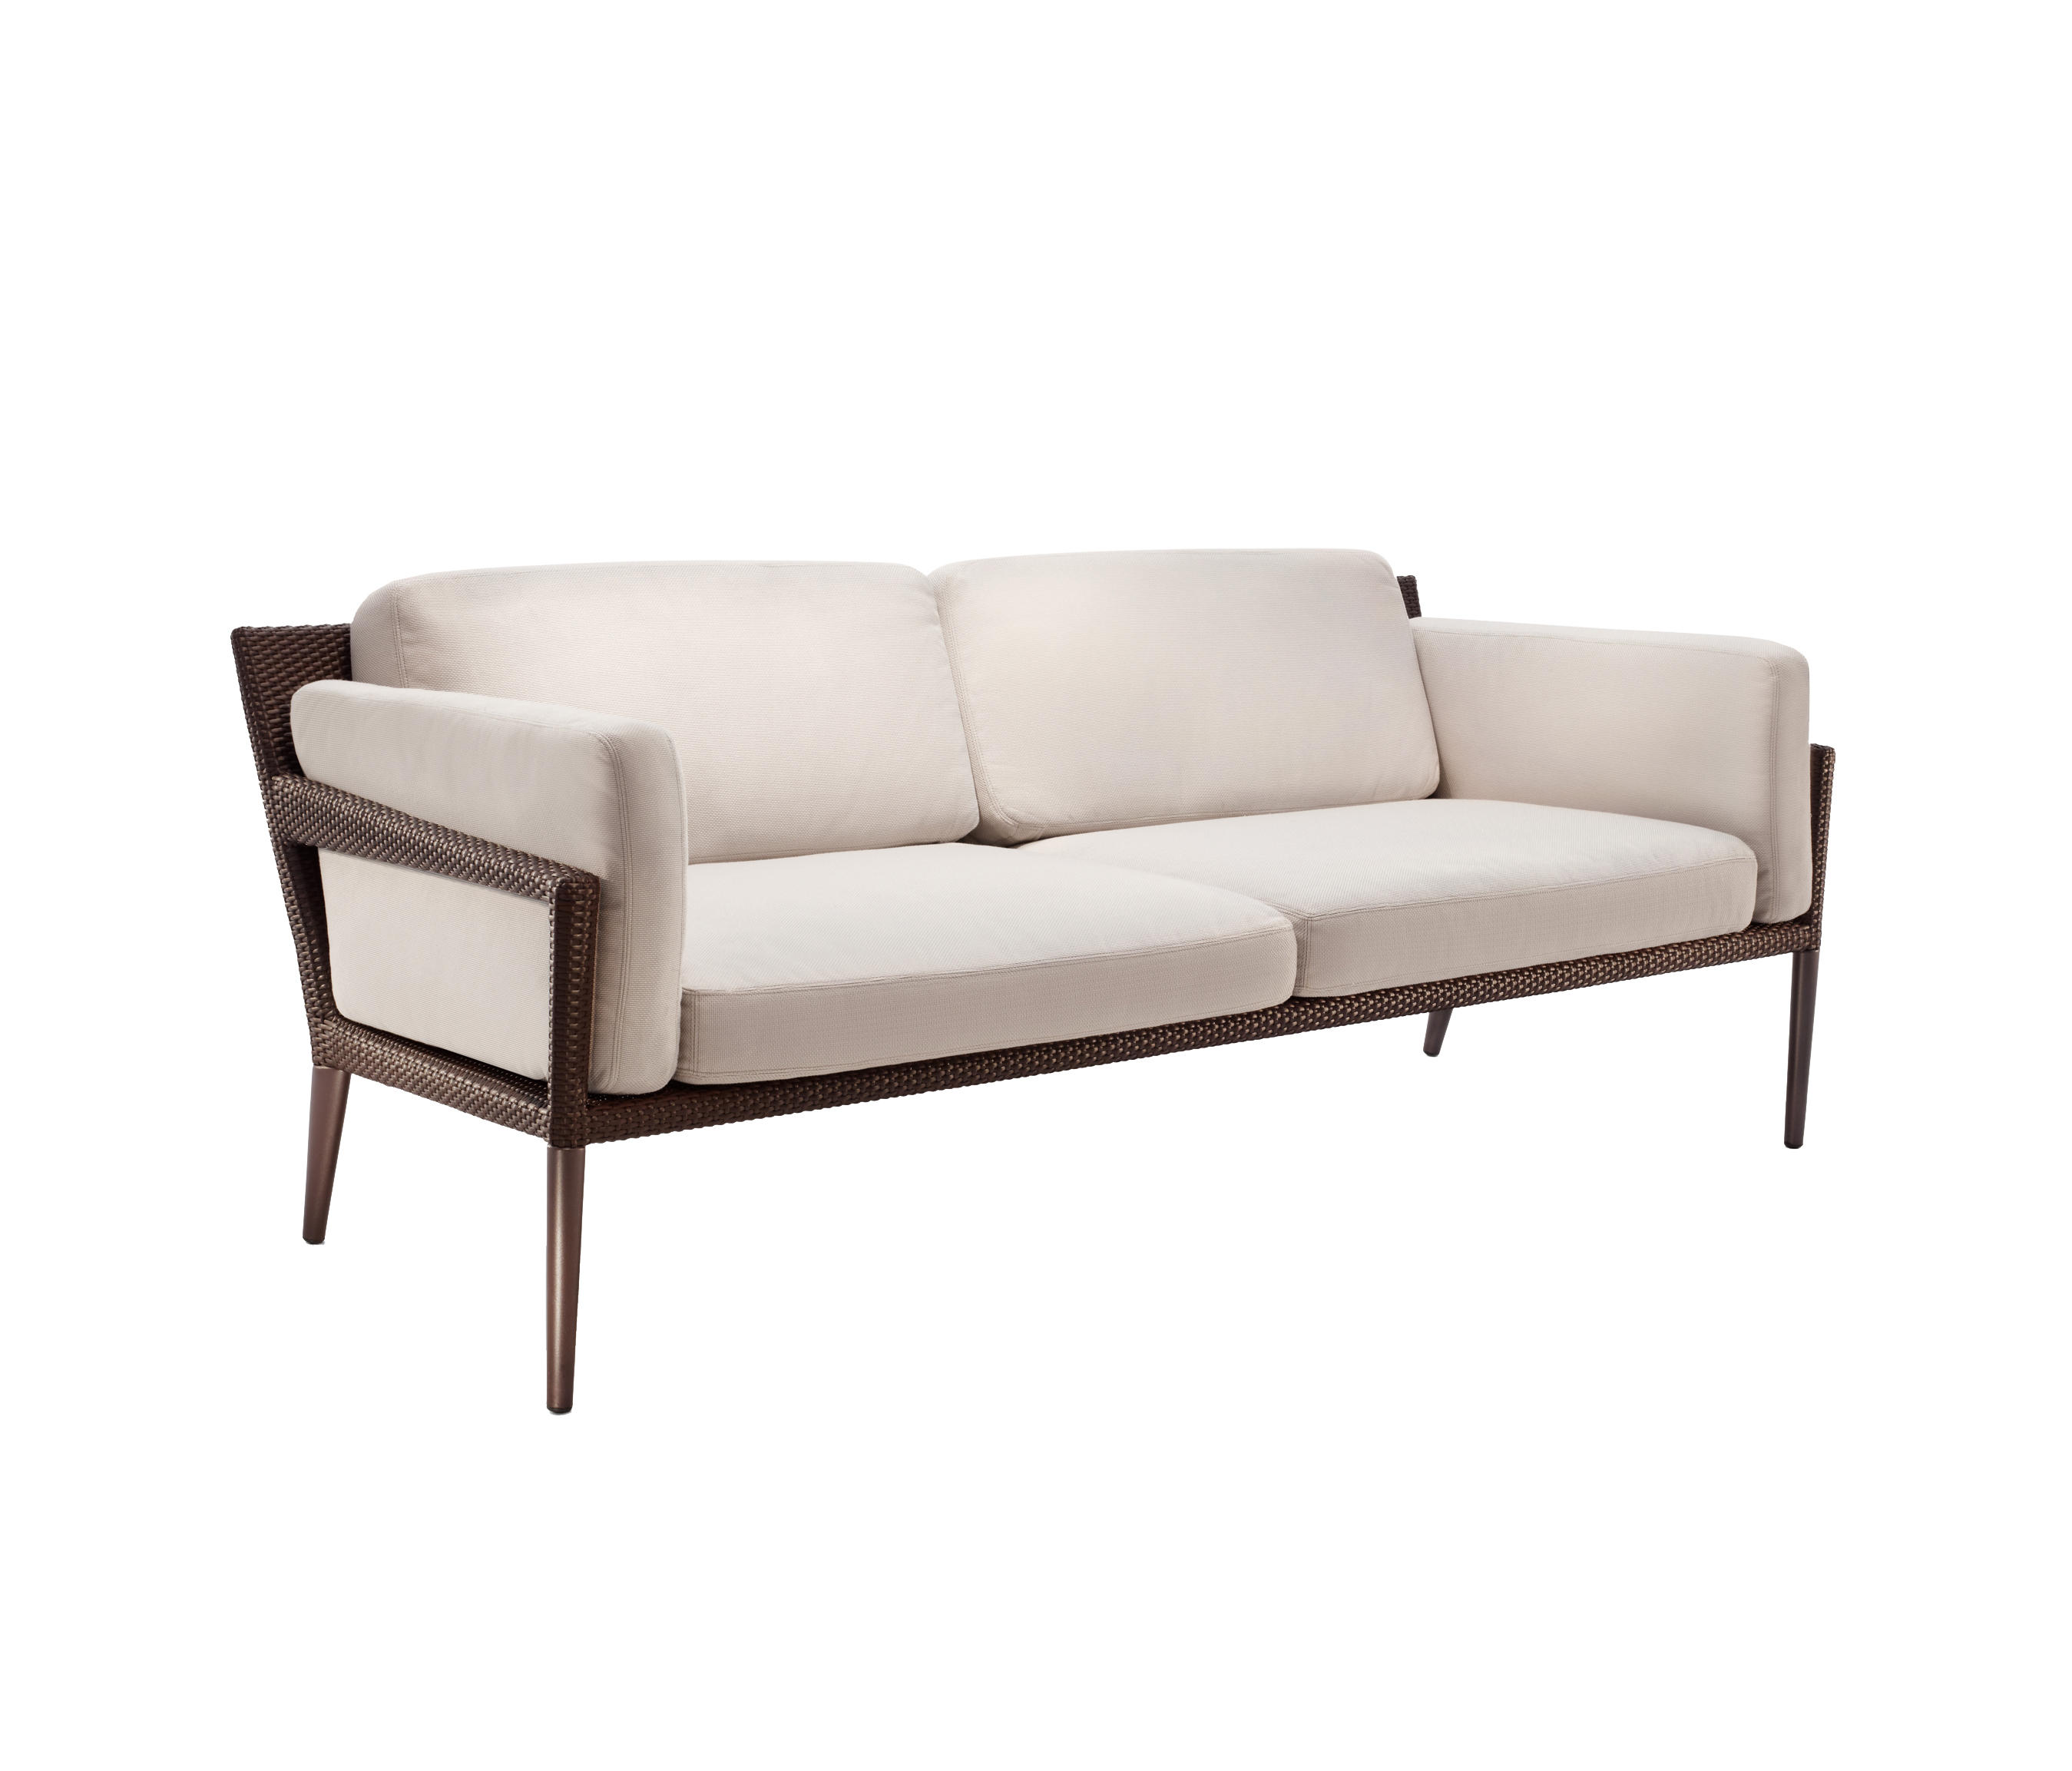 TRIBECA  SEATER Garden Sofas From DEDON Architonic - Dedon outdoor furniture